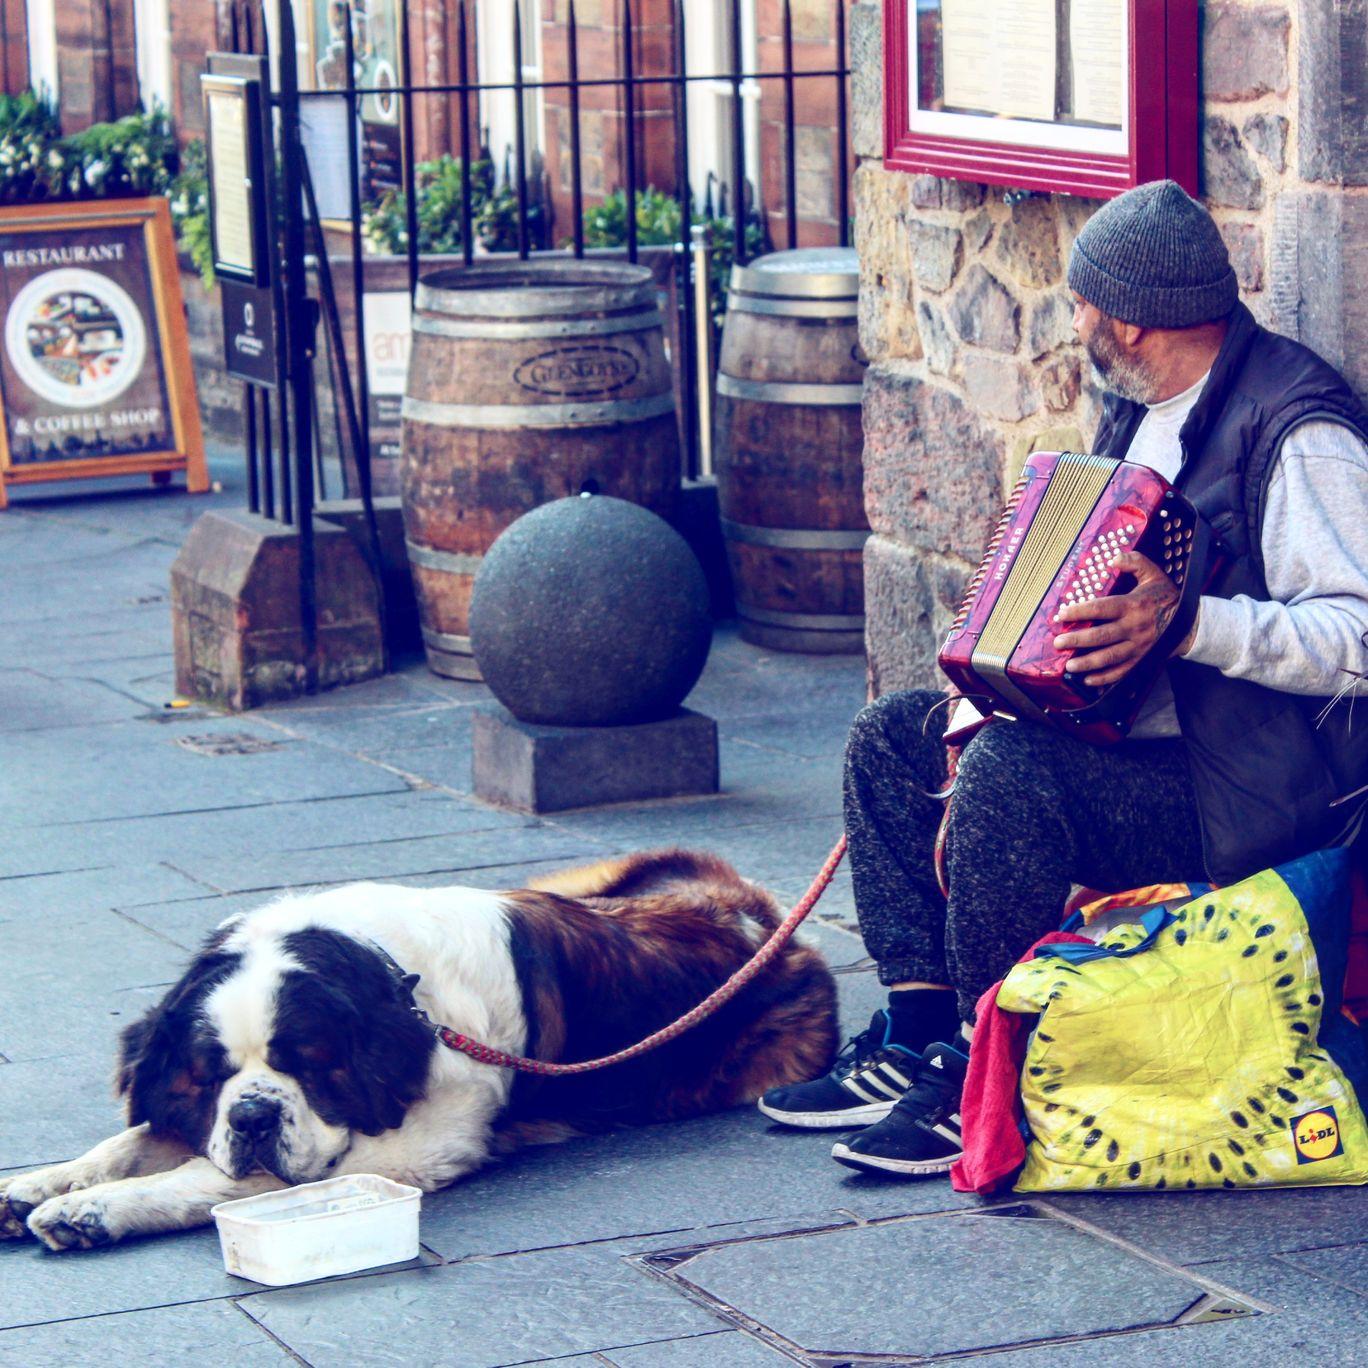 Photo of Edinburgh By Sharly